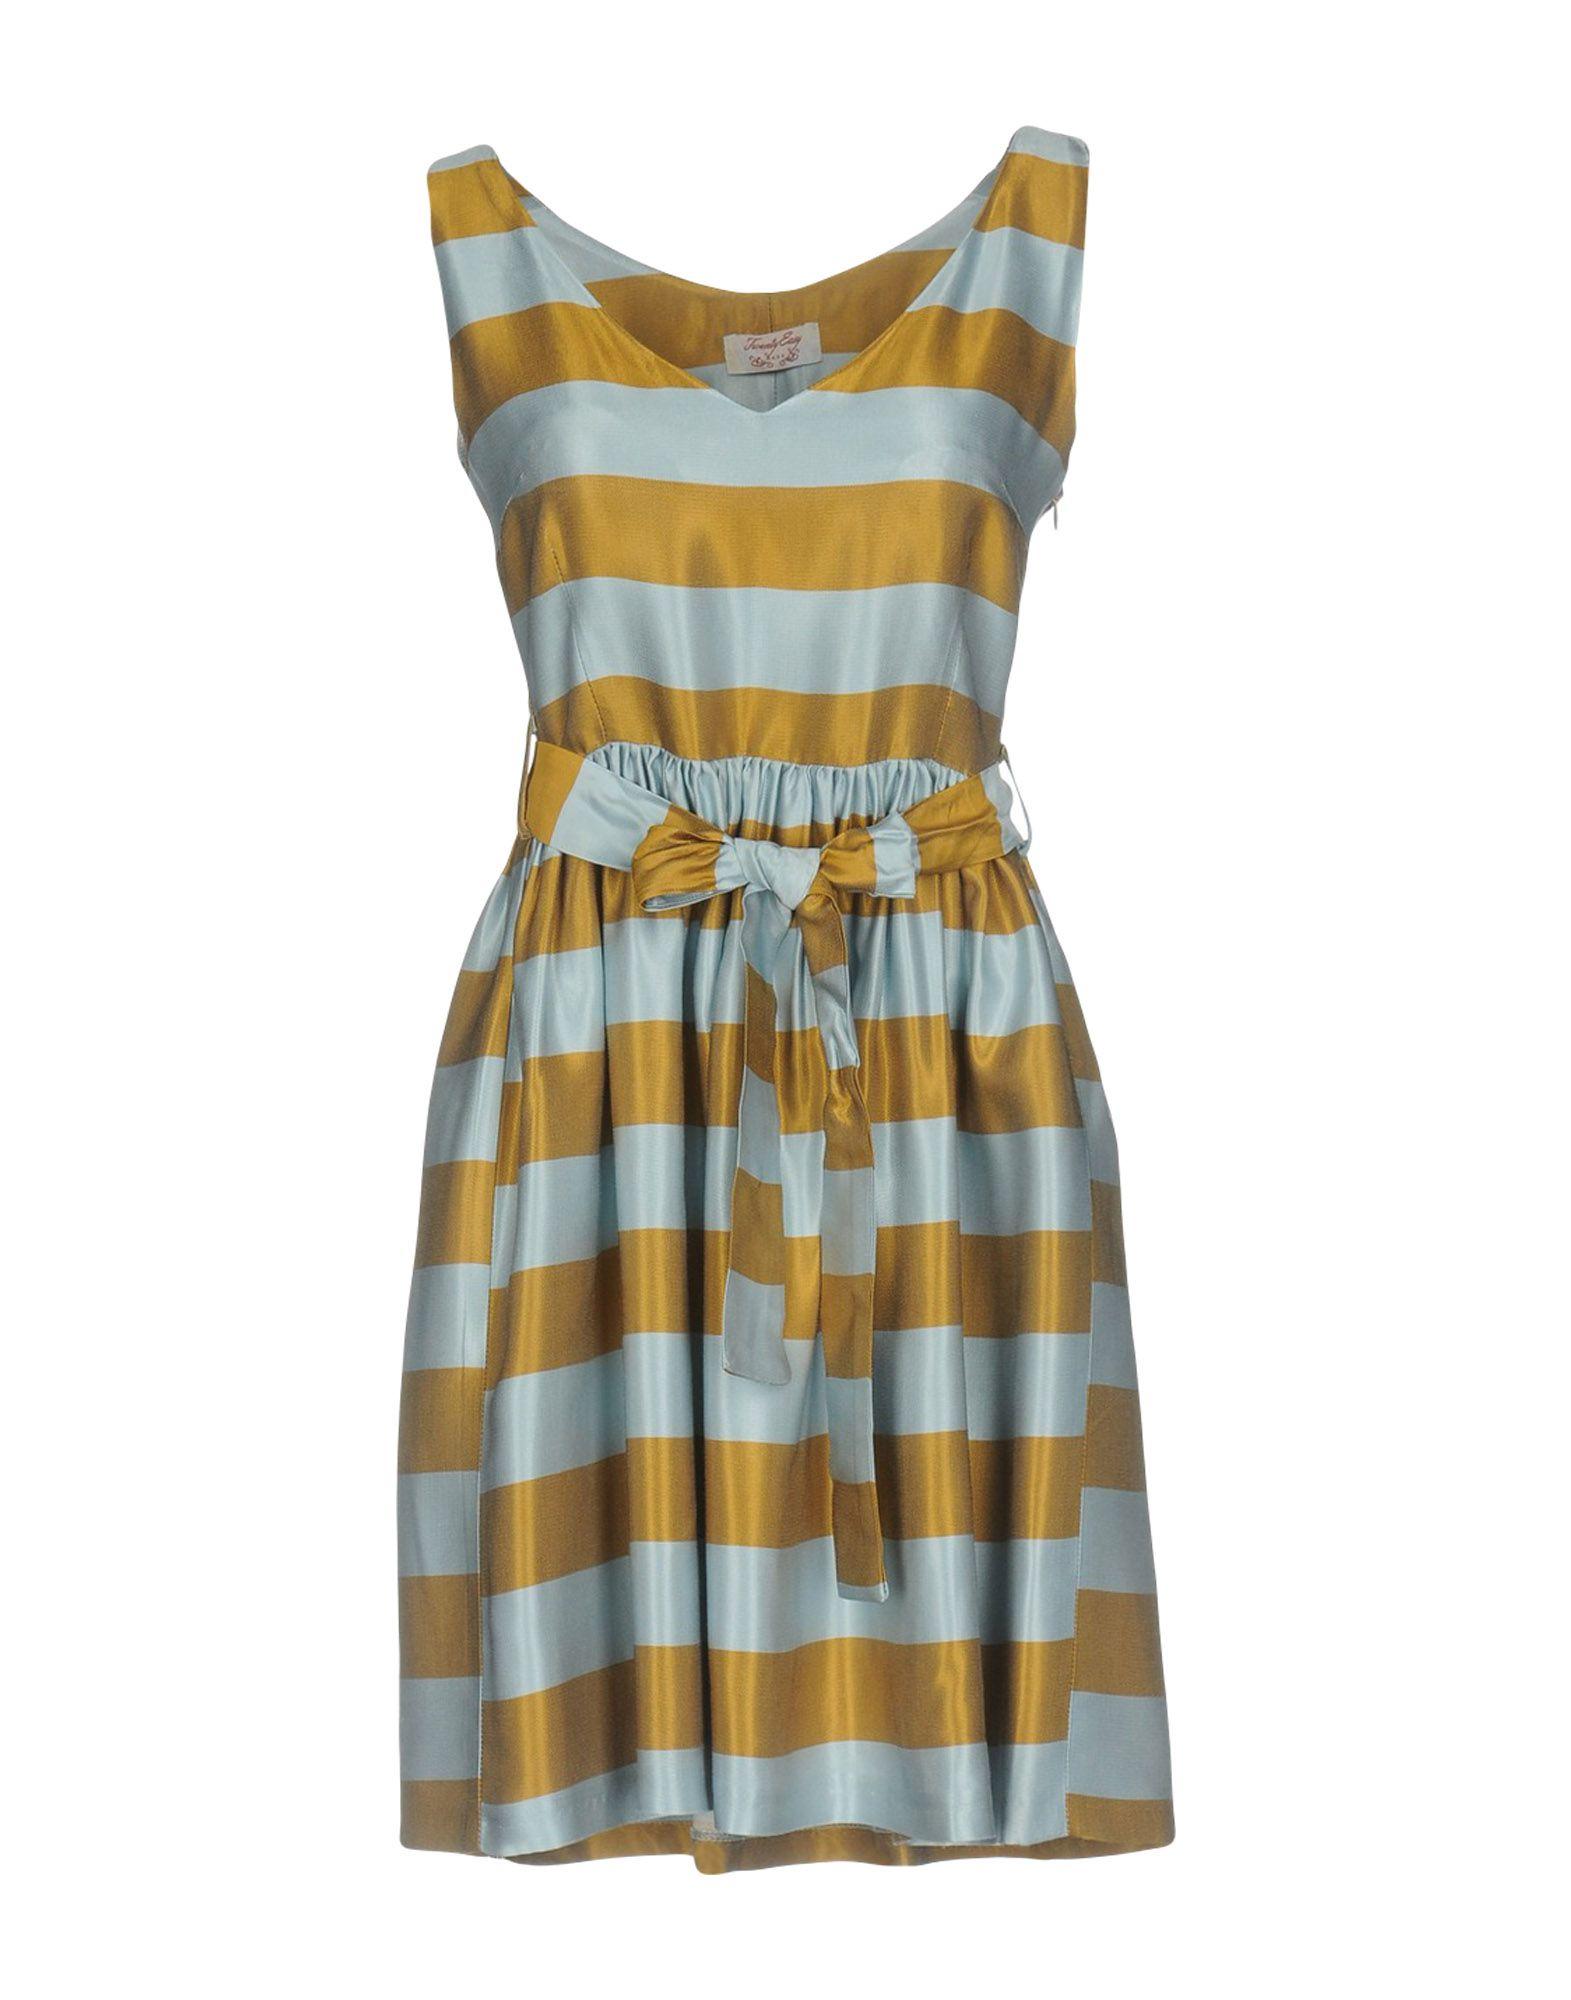 TWENTY EASY by KAOS Damen Kurzes Kleid Farbe Himmelblau Größe 6 - broschei